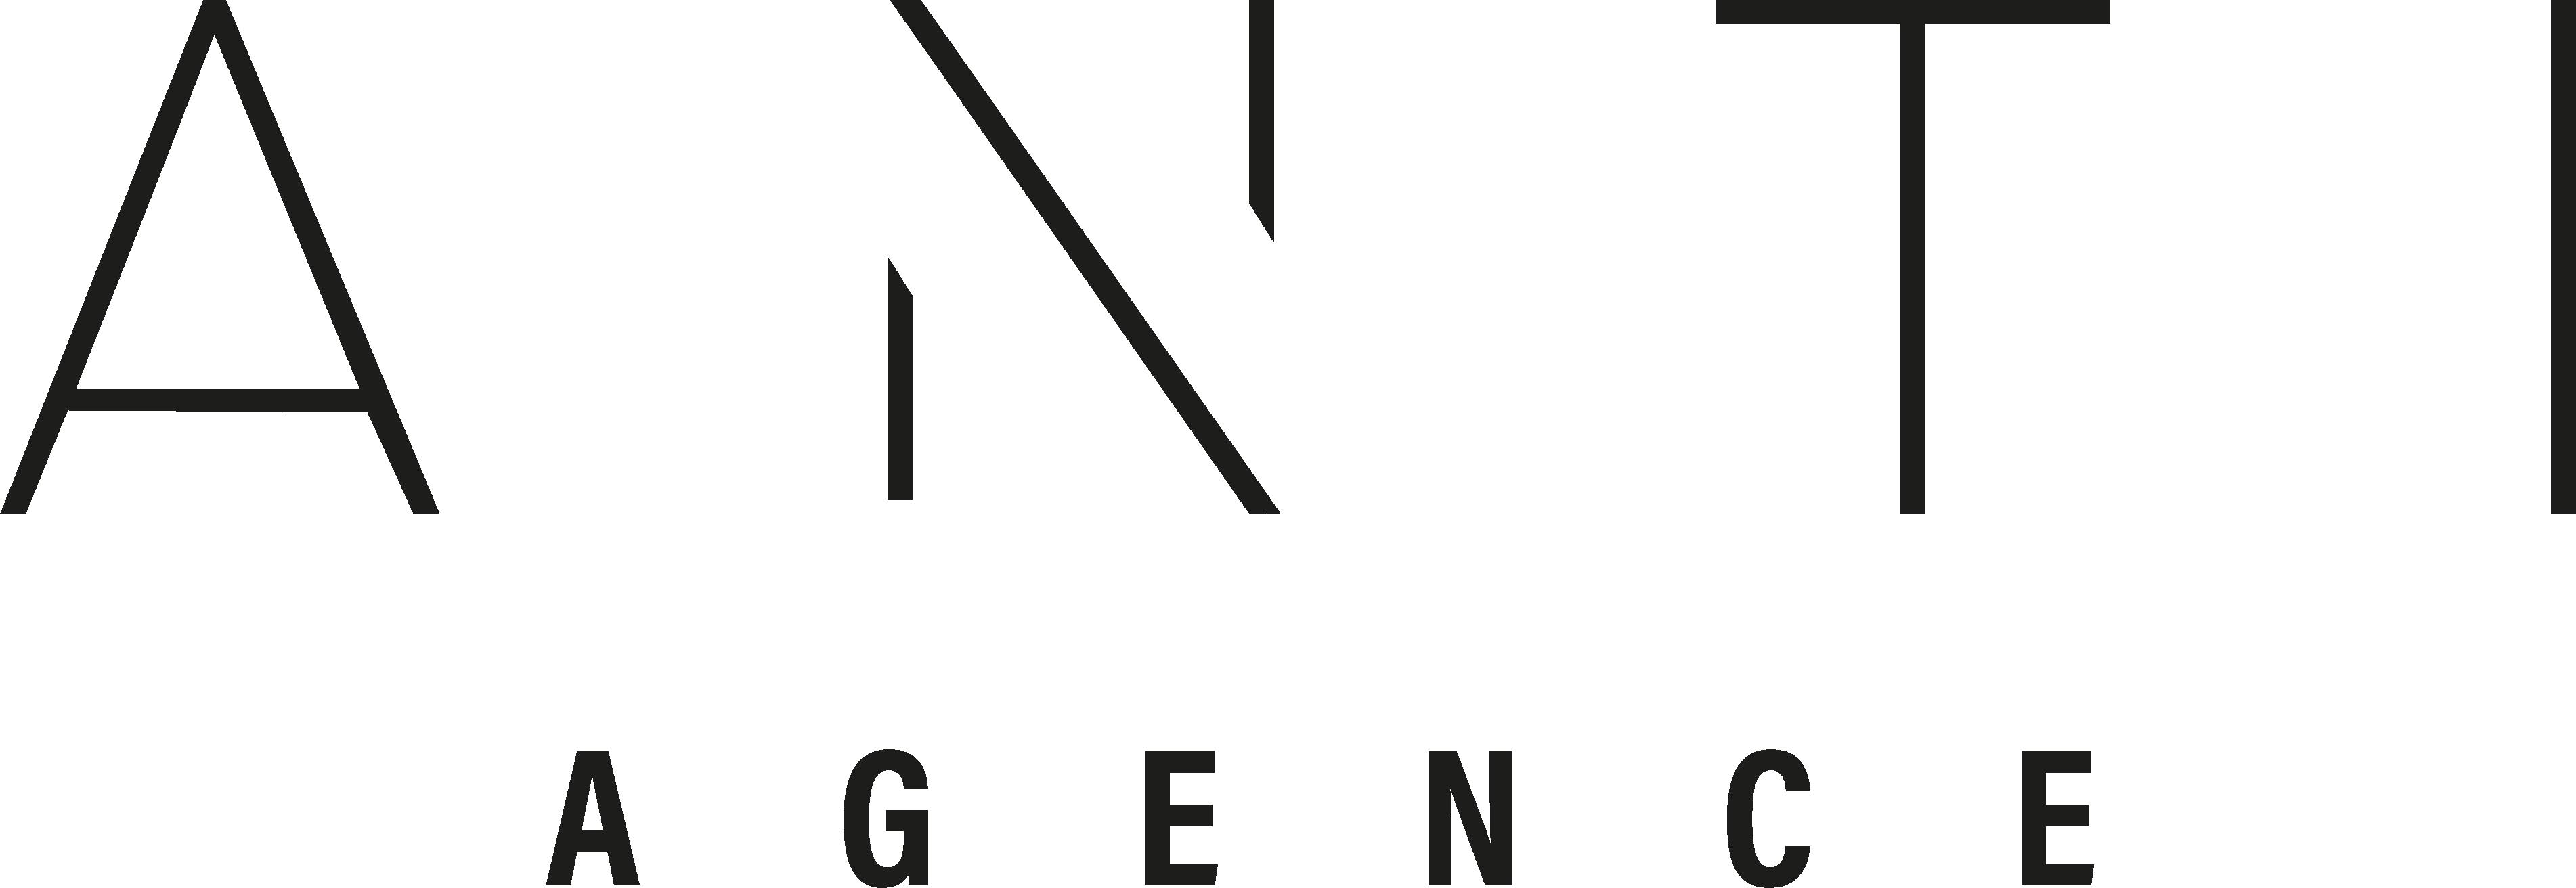 L'Antiagence